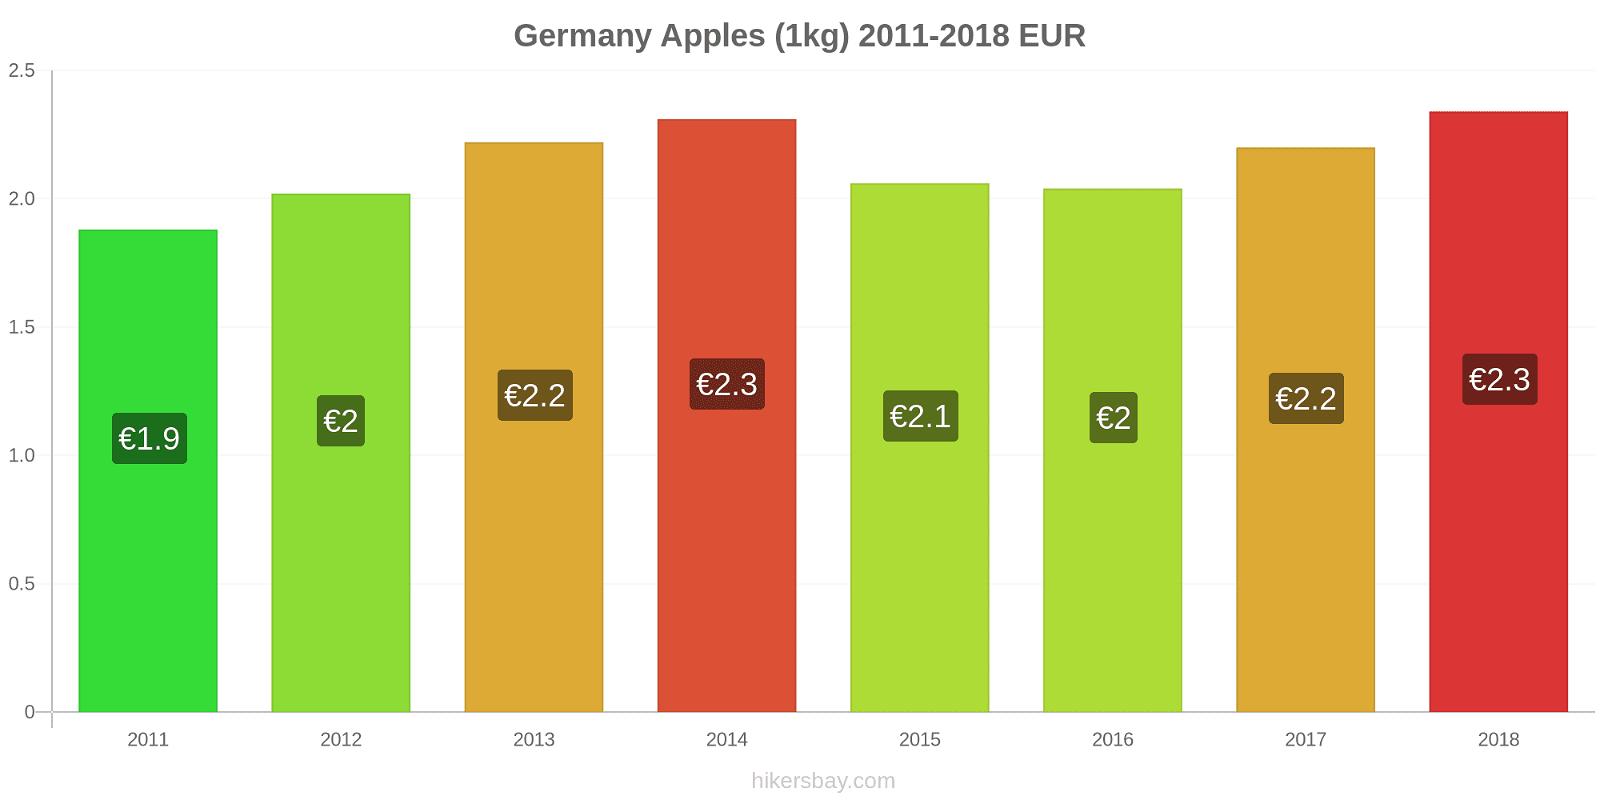 Germany price changes Apples (1kg) hikersbay.com